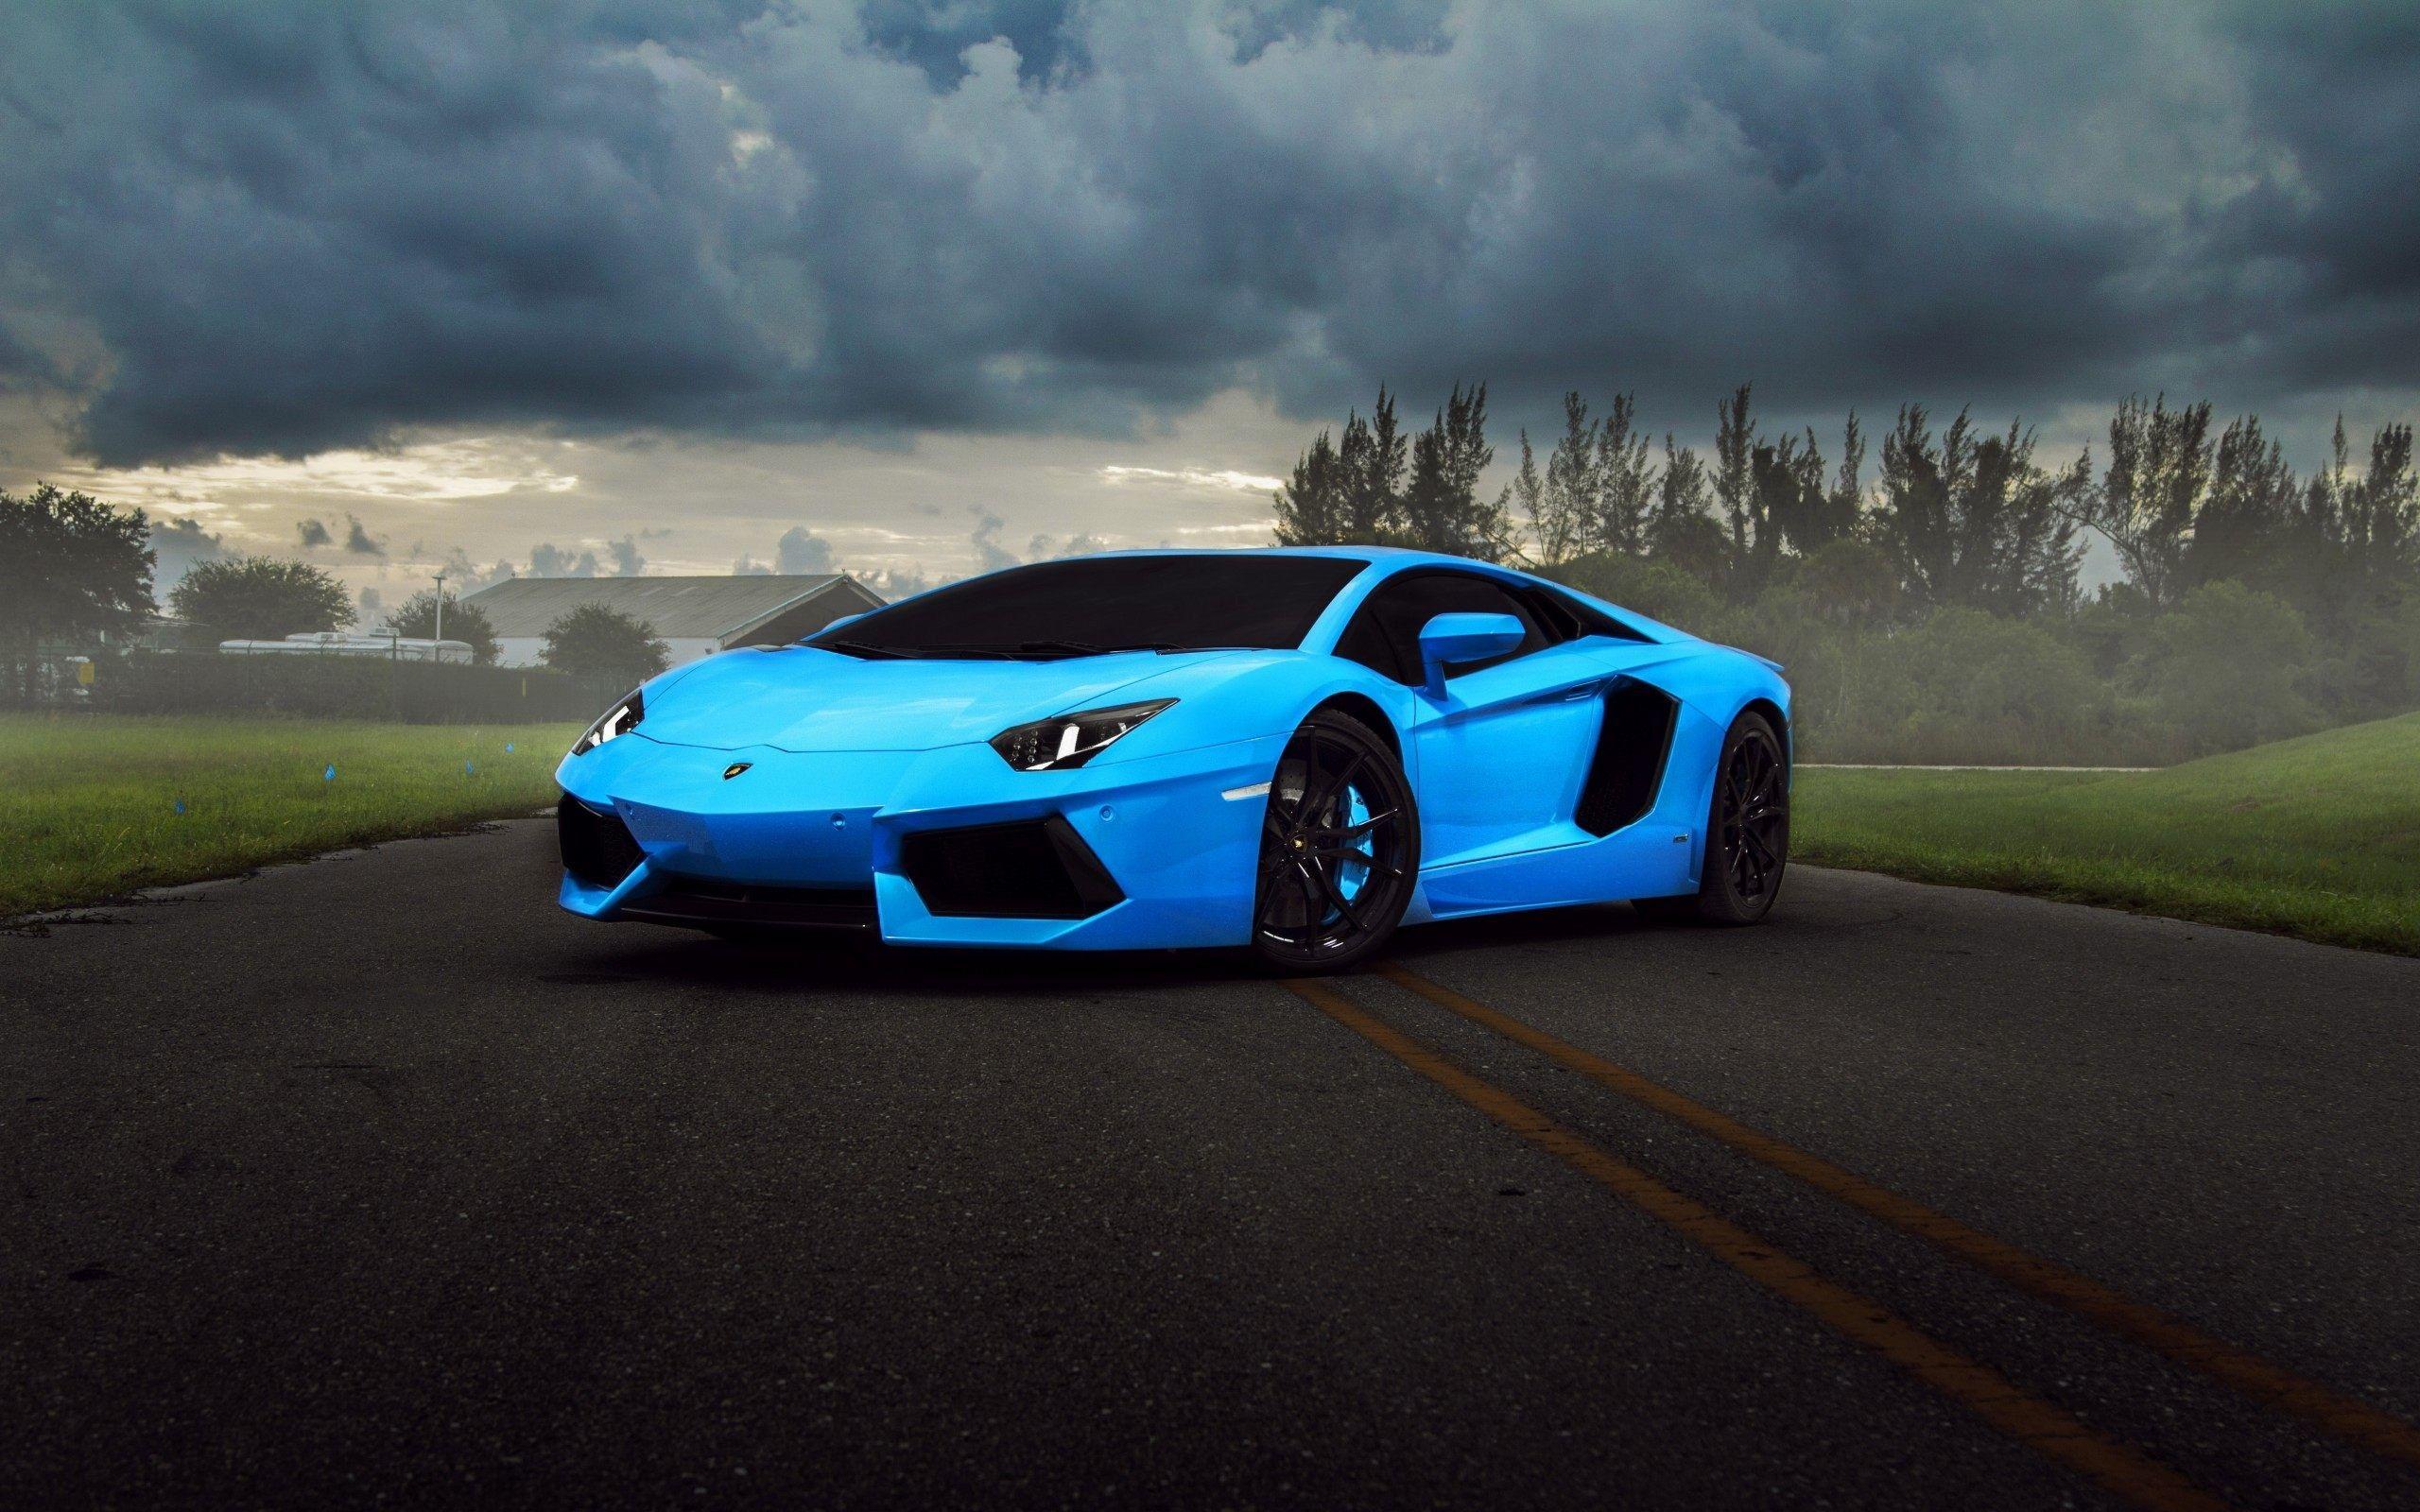 Luxury Car Dekstop Wallpaper Hd Blue Lamborghini Car Wallpapers Super Cars